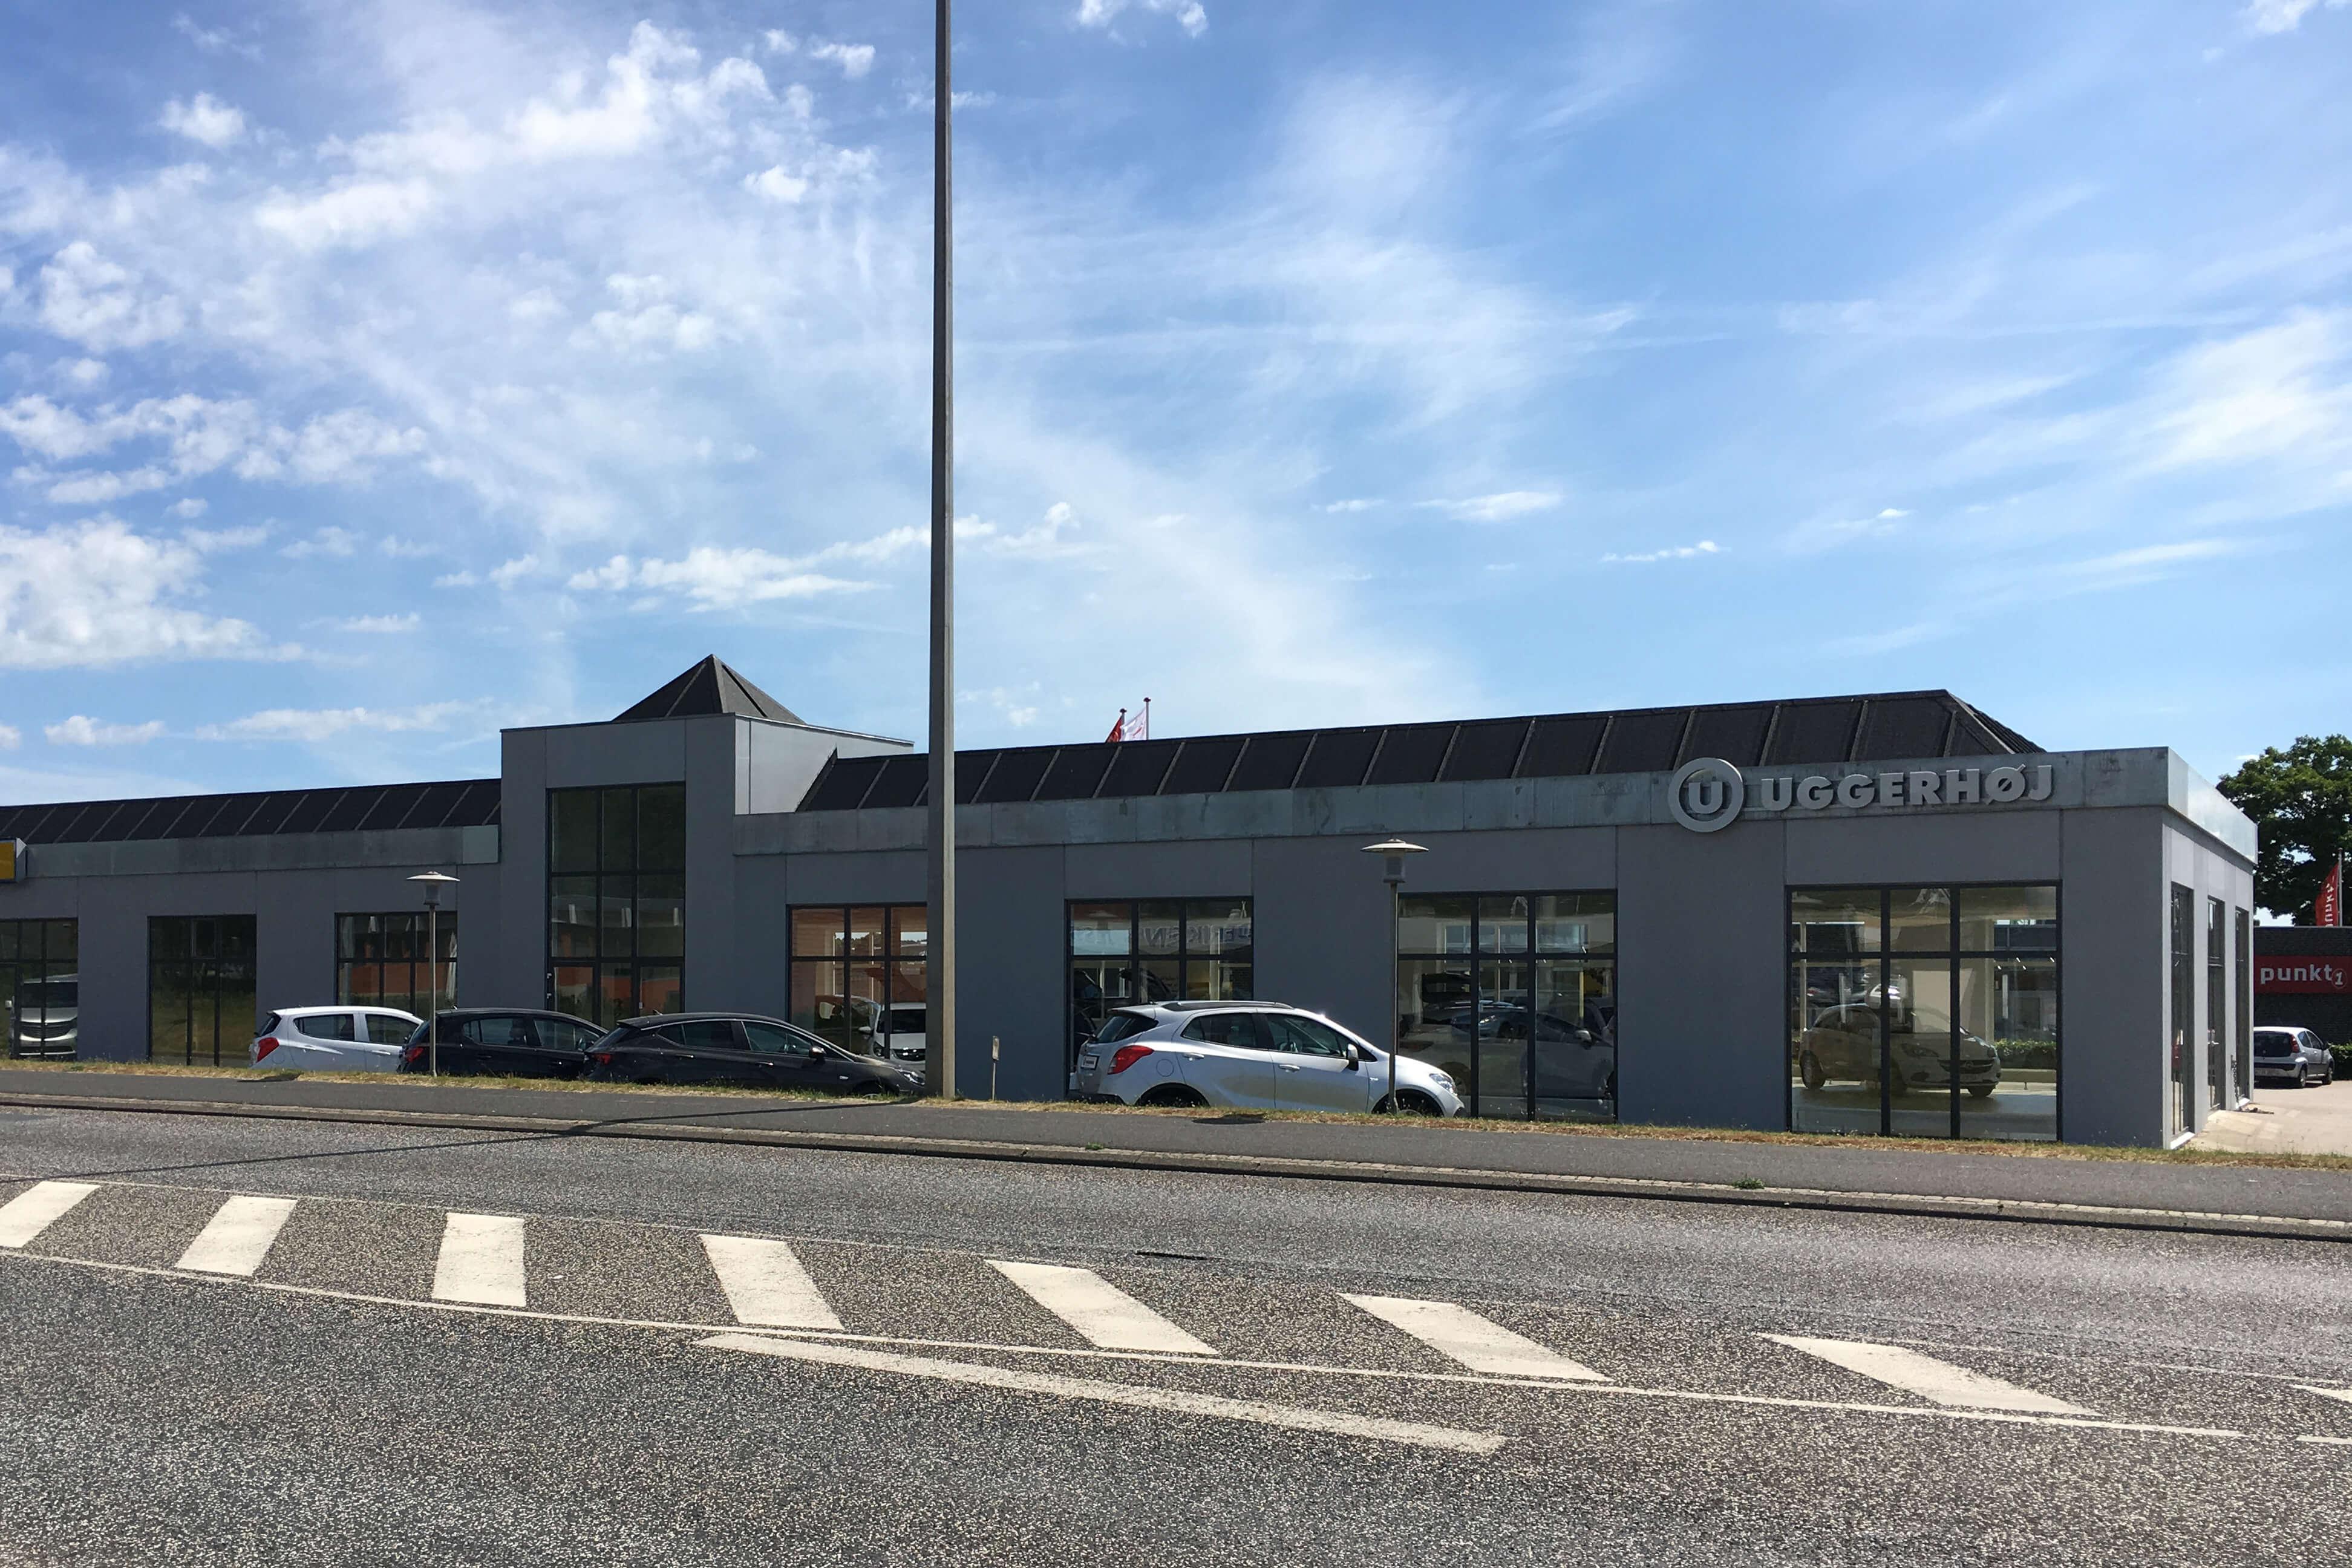 eskortere com Frederikshavnsvej 174